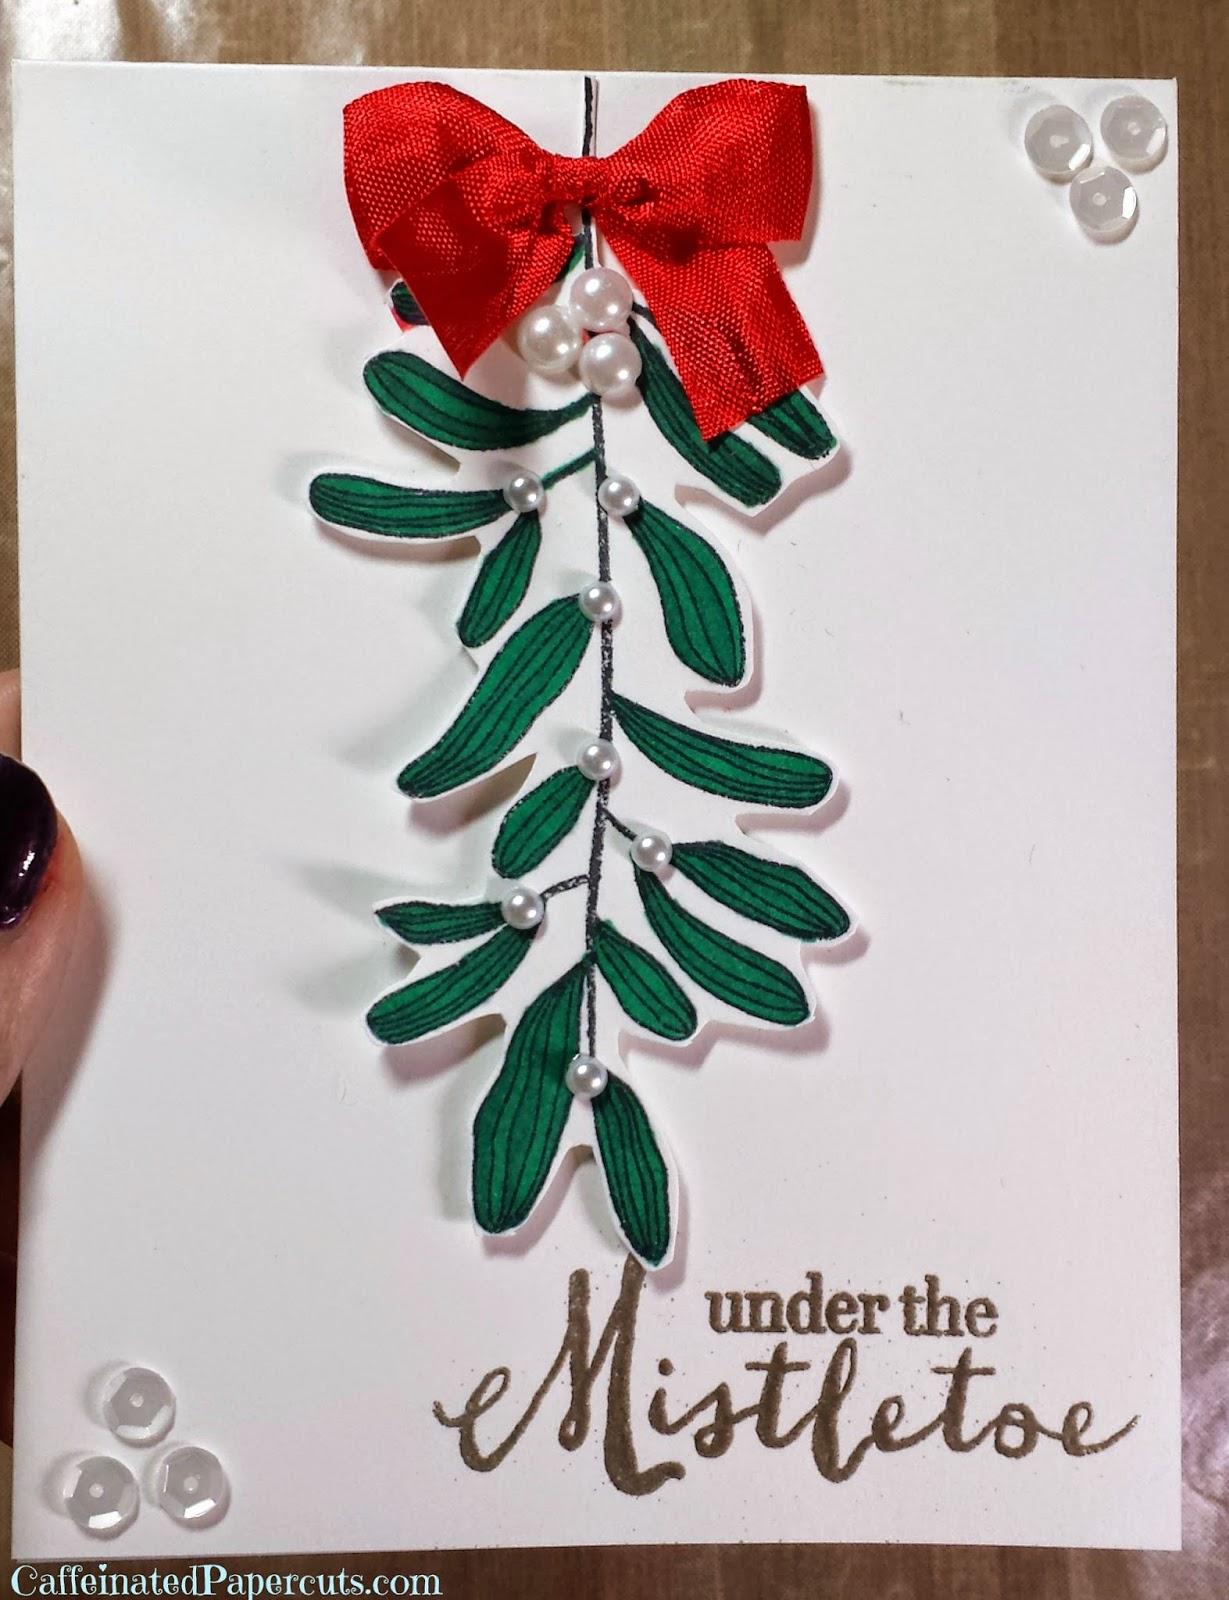 under the mistletoe hero arts by caffeinated papercuts